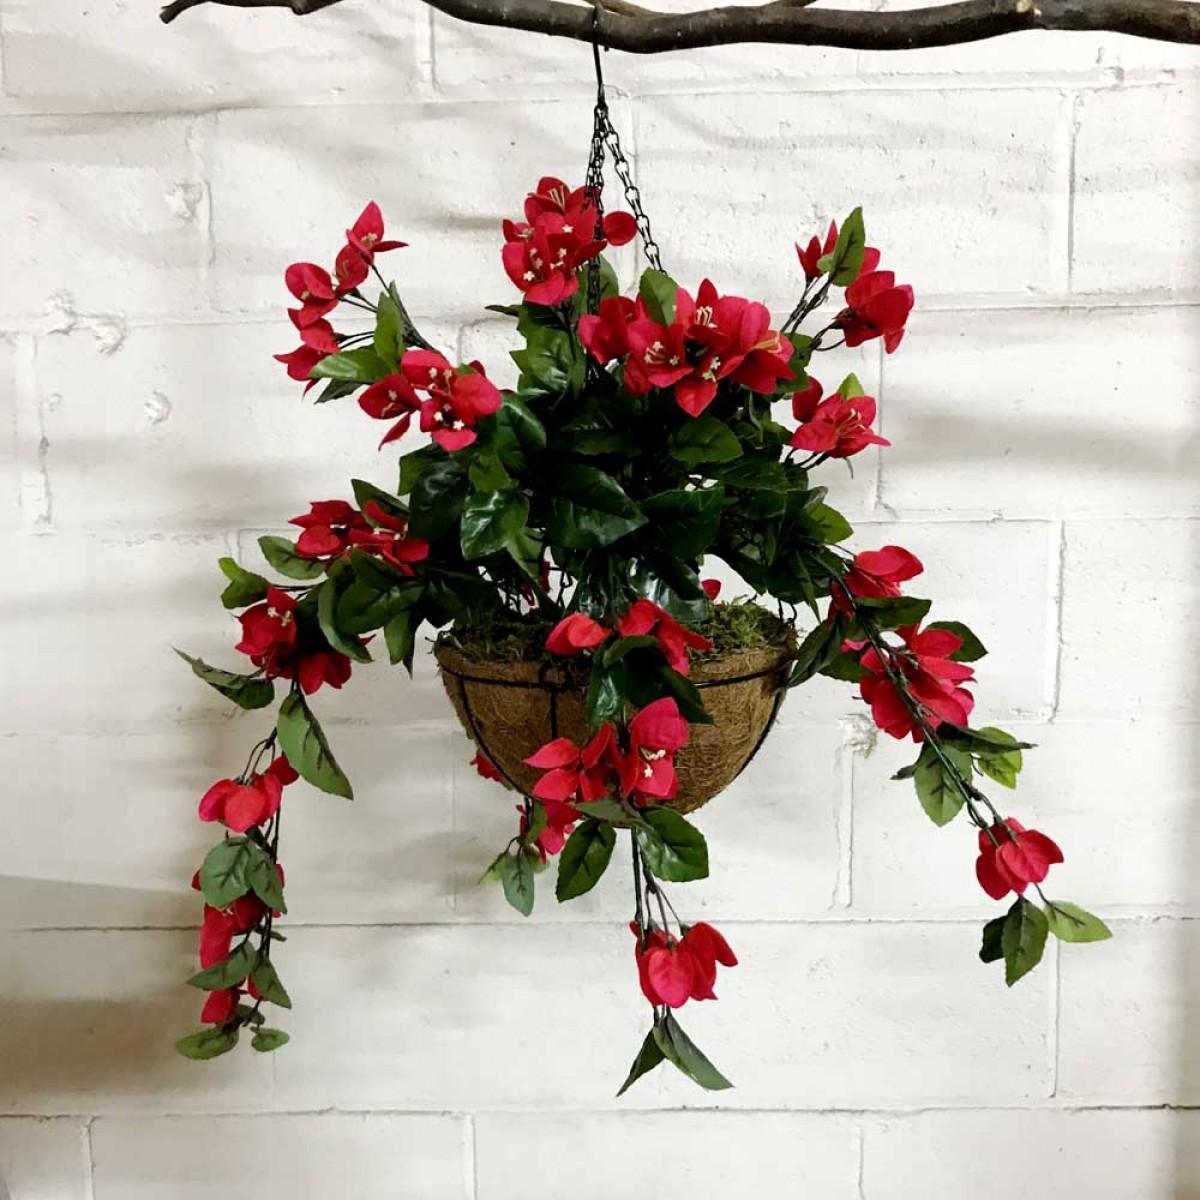 Whole Foods Florist Wedding: Bougainvillea - Artificial Hanging Baskets